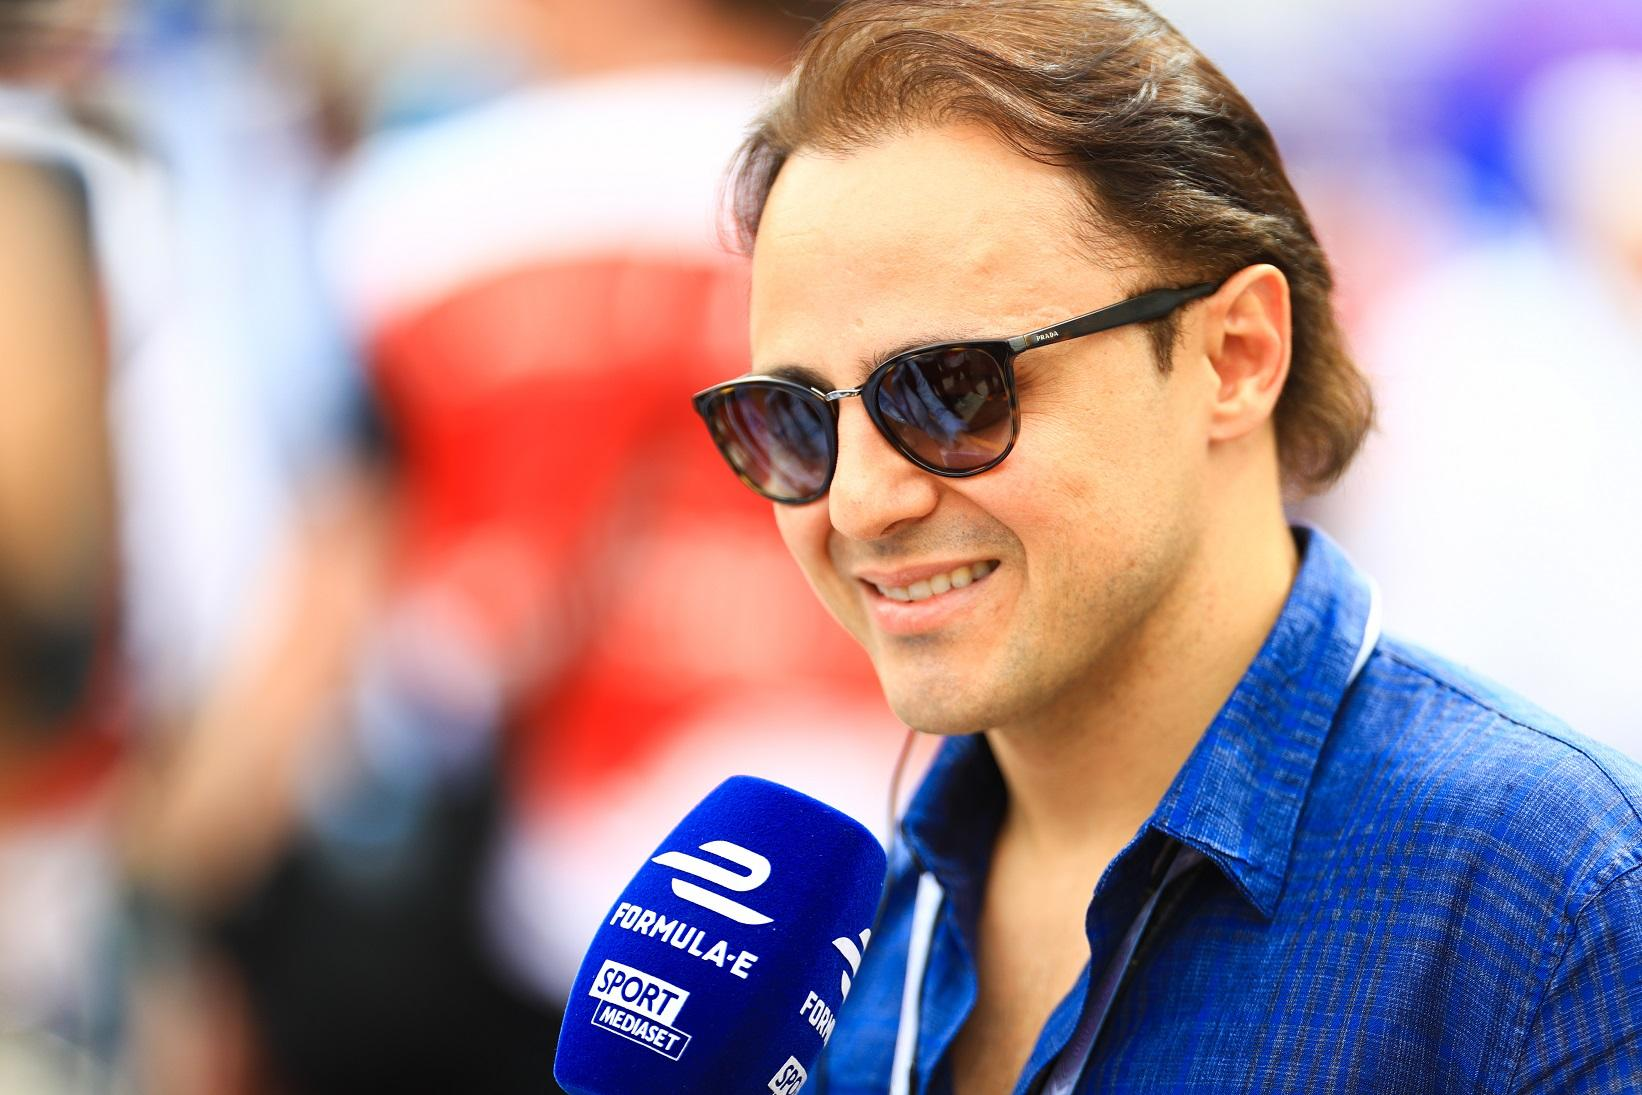 Felipe Massa has signed a three-year deal with Venturi, starting next season